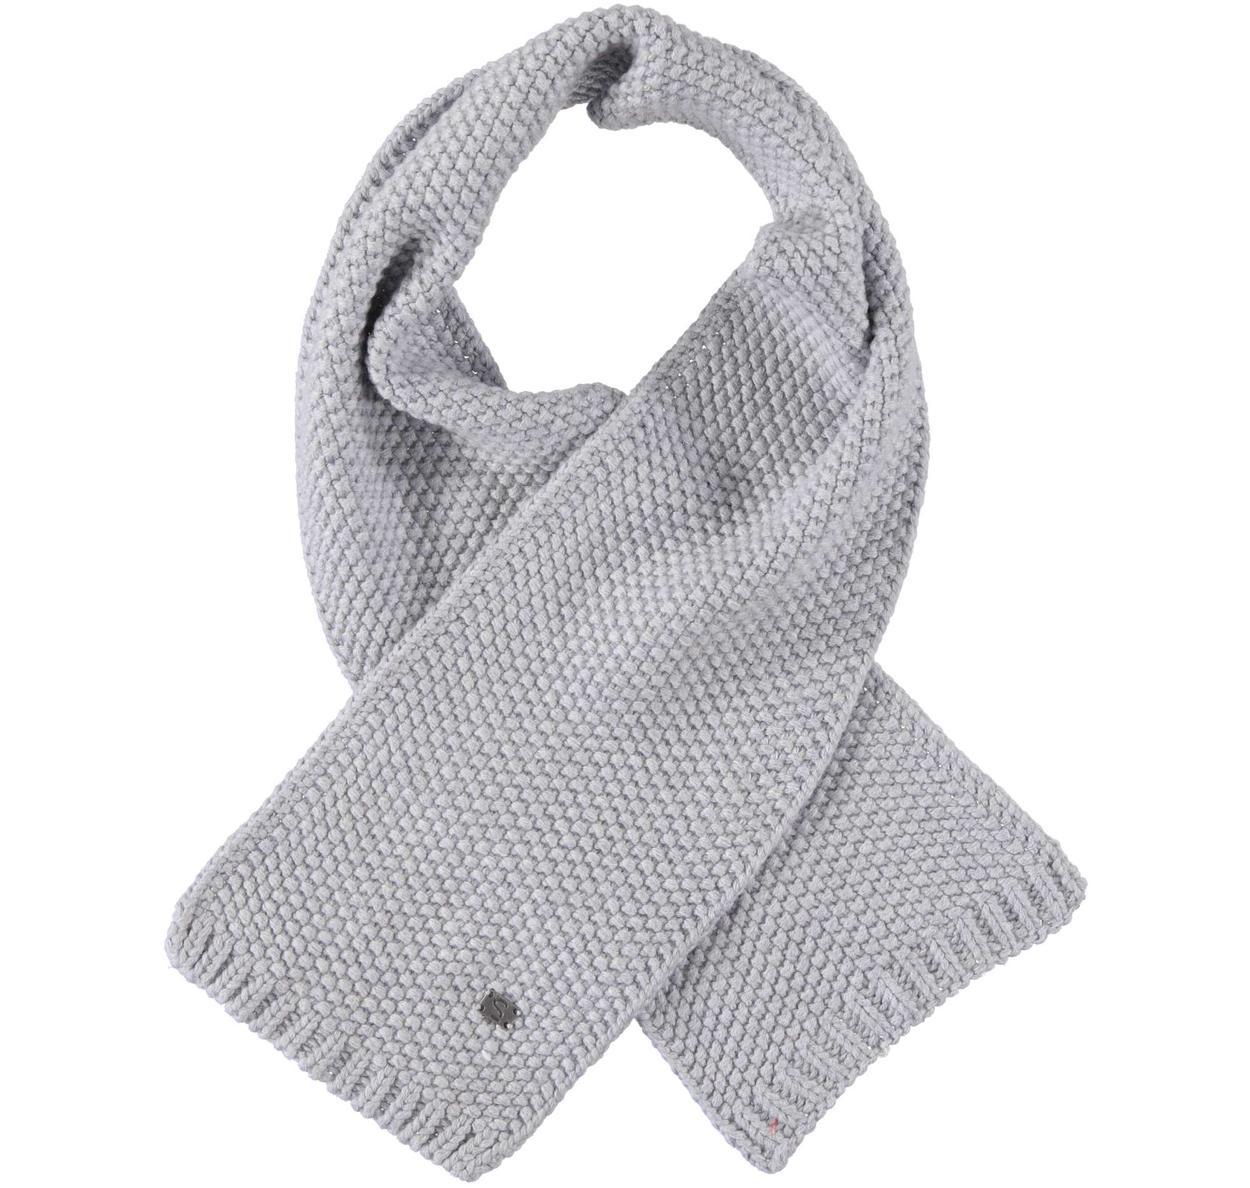 Sciarpa in tricot per bambino da 6 mesi a 7 anni Sarabanda ... 55ac1946b0ba